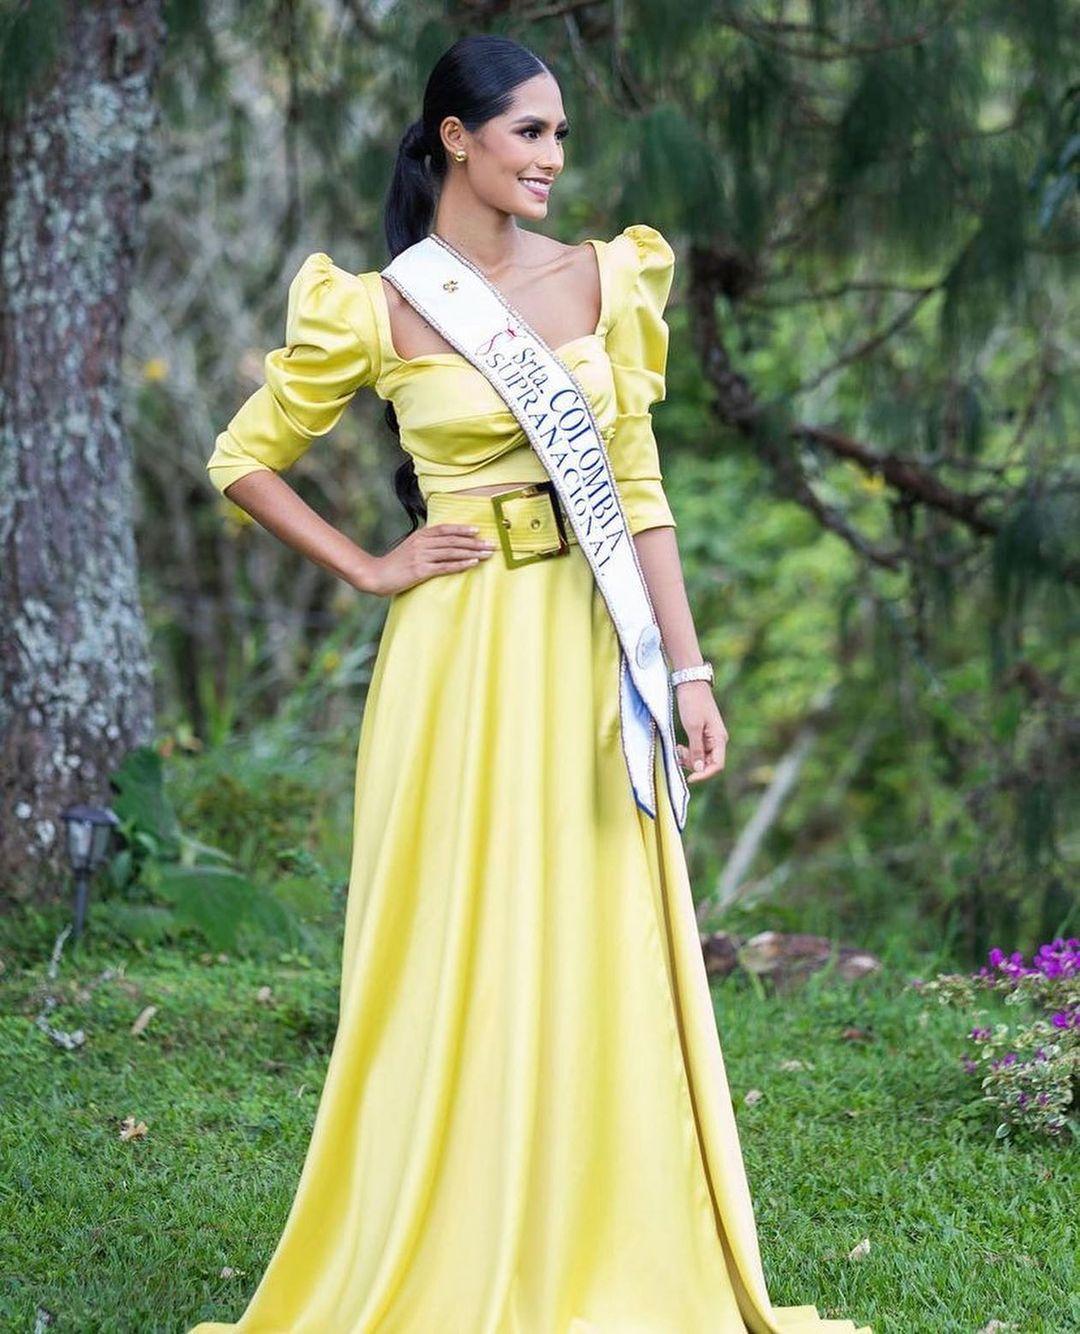 valentina aldana, miss supranational colombia 2021. 22765613